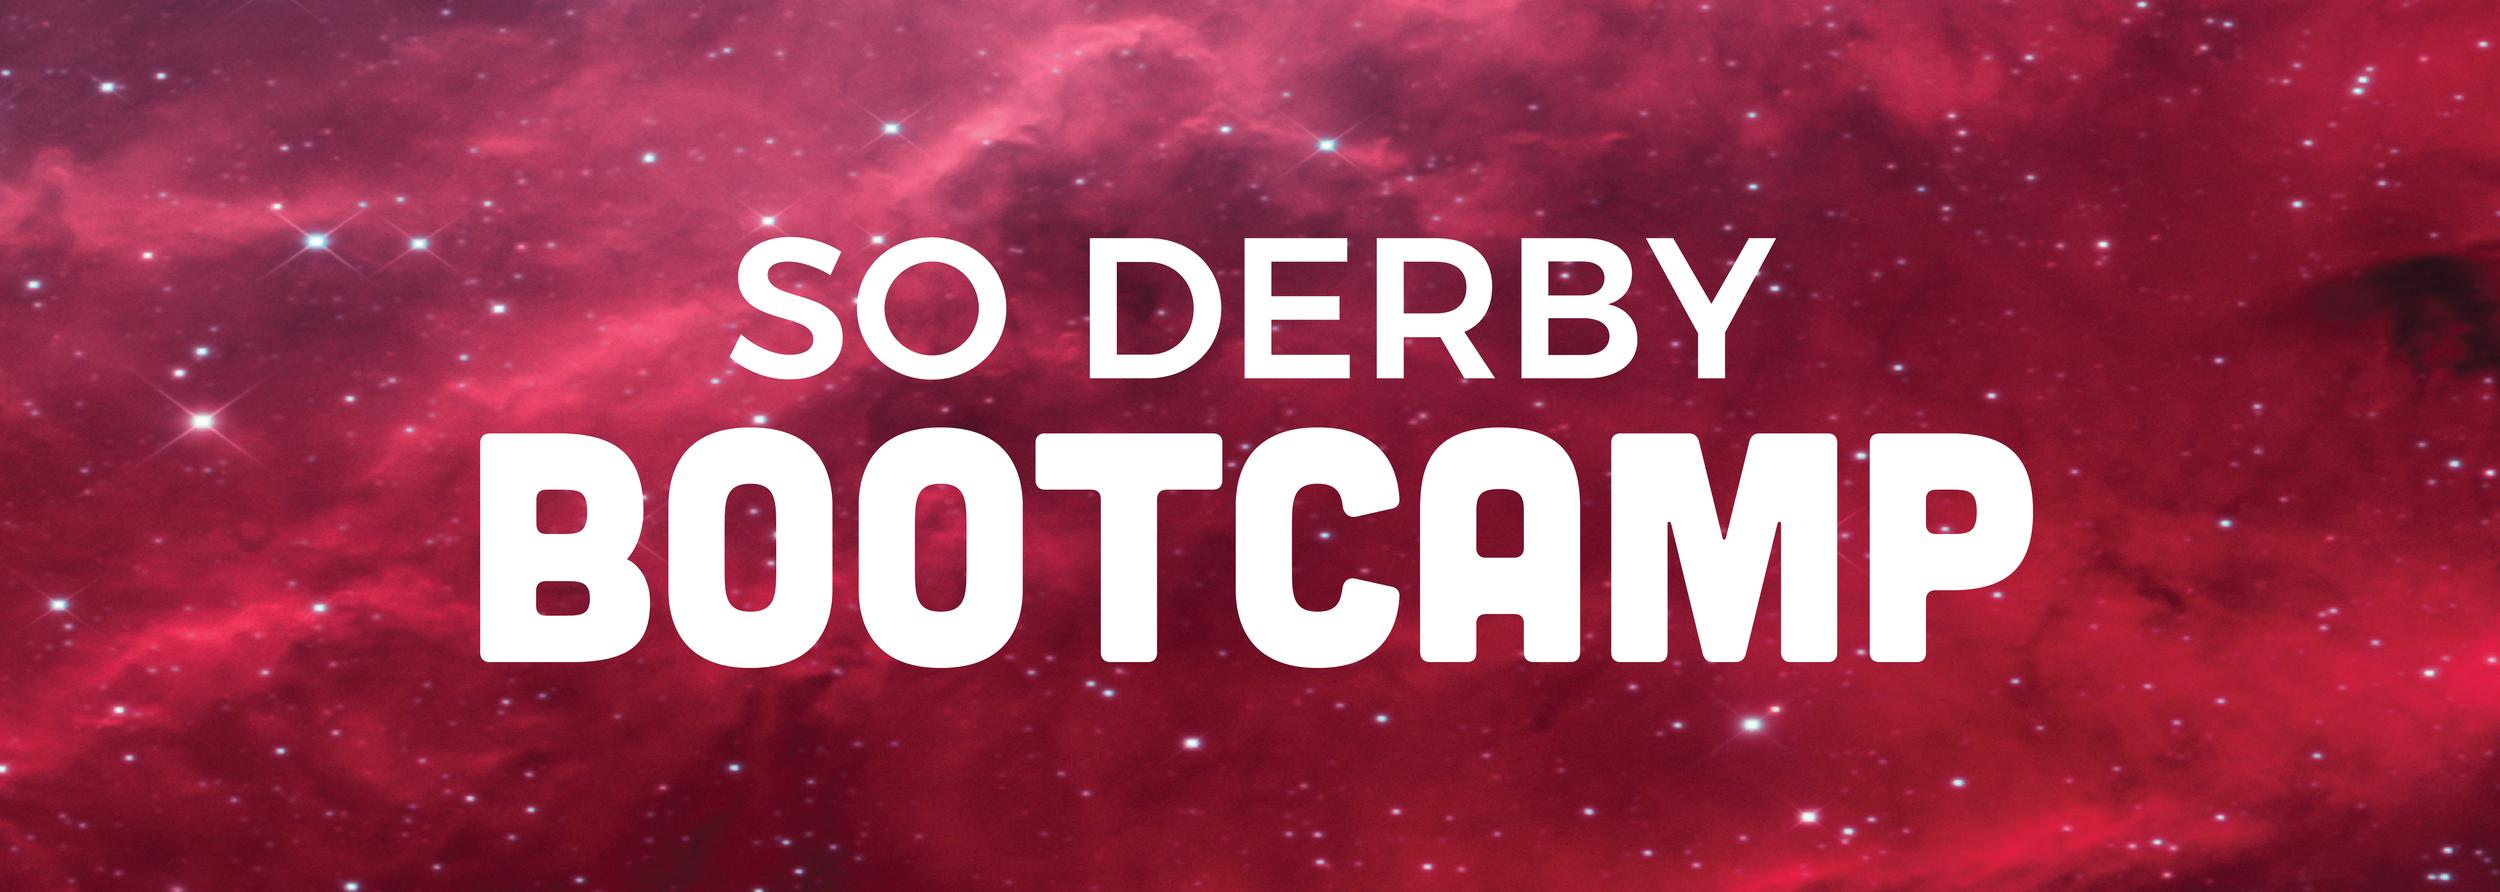 Bootcamp_Website_Header-01.png